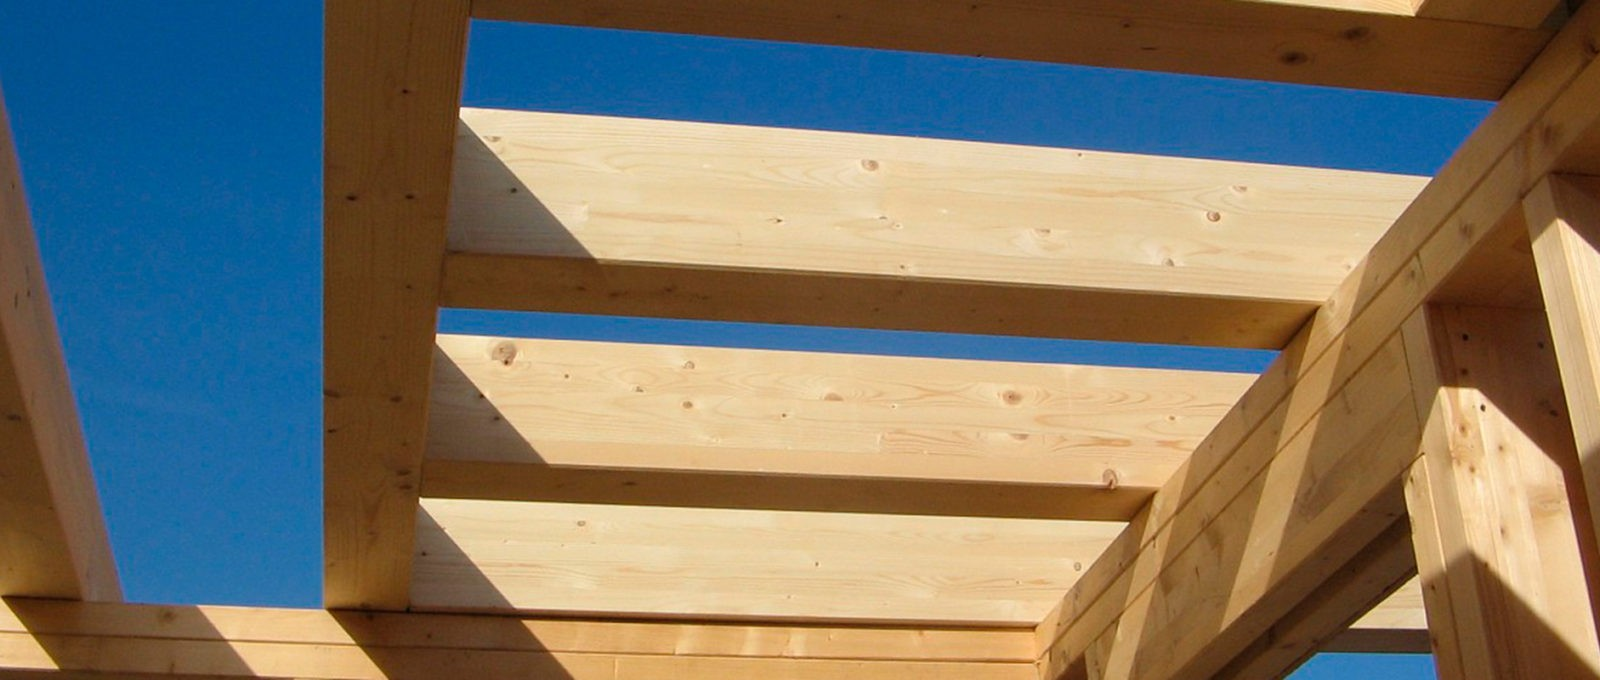 Casa in legno con sistema a telaio